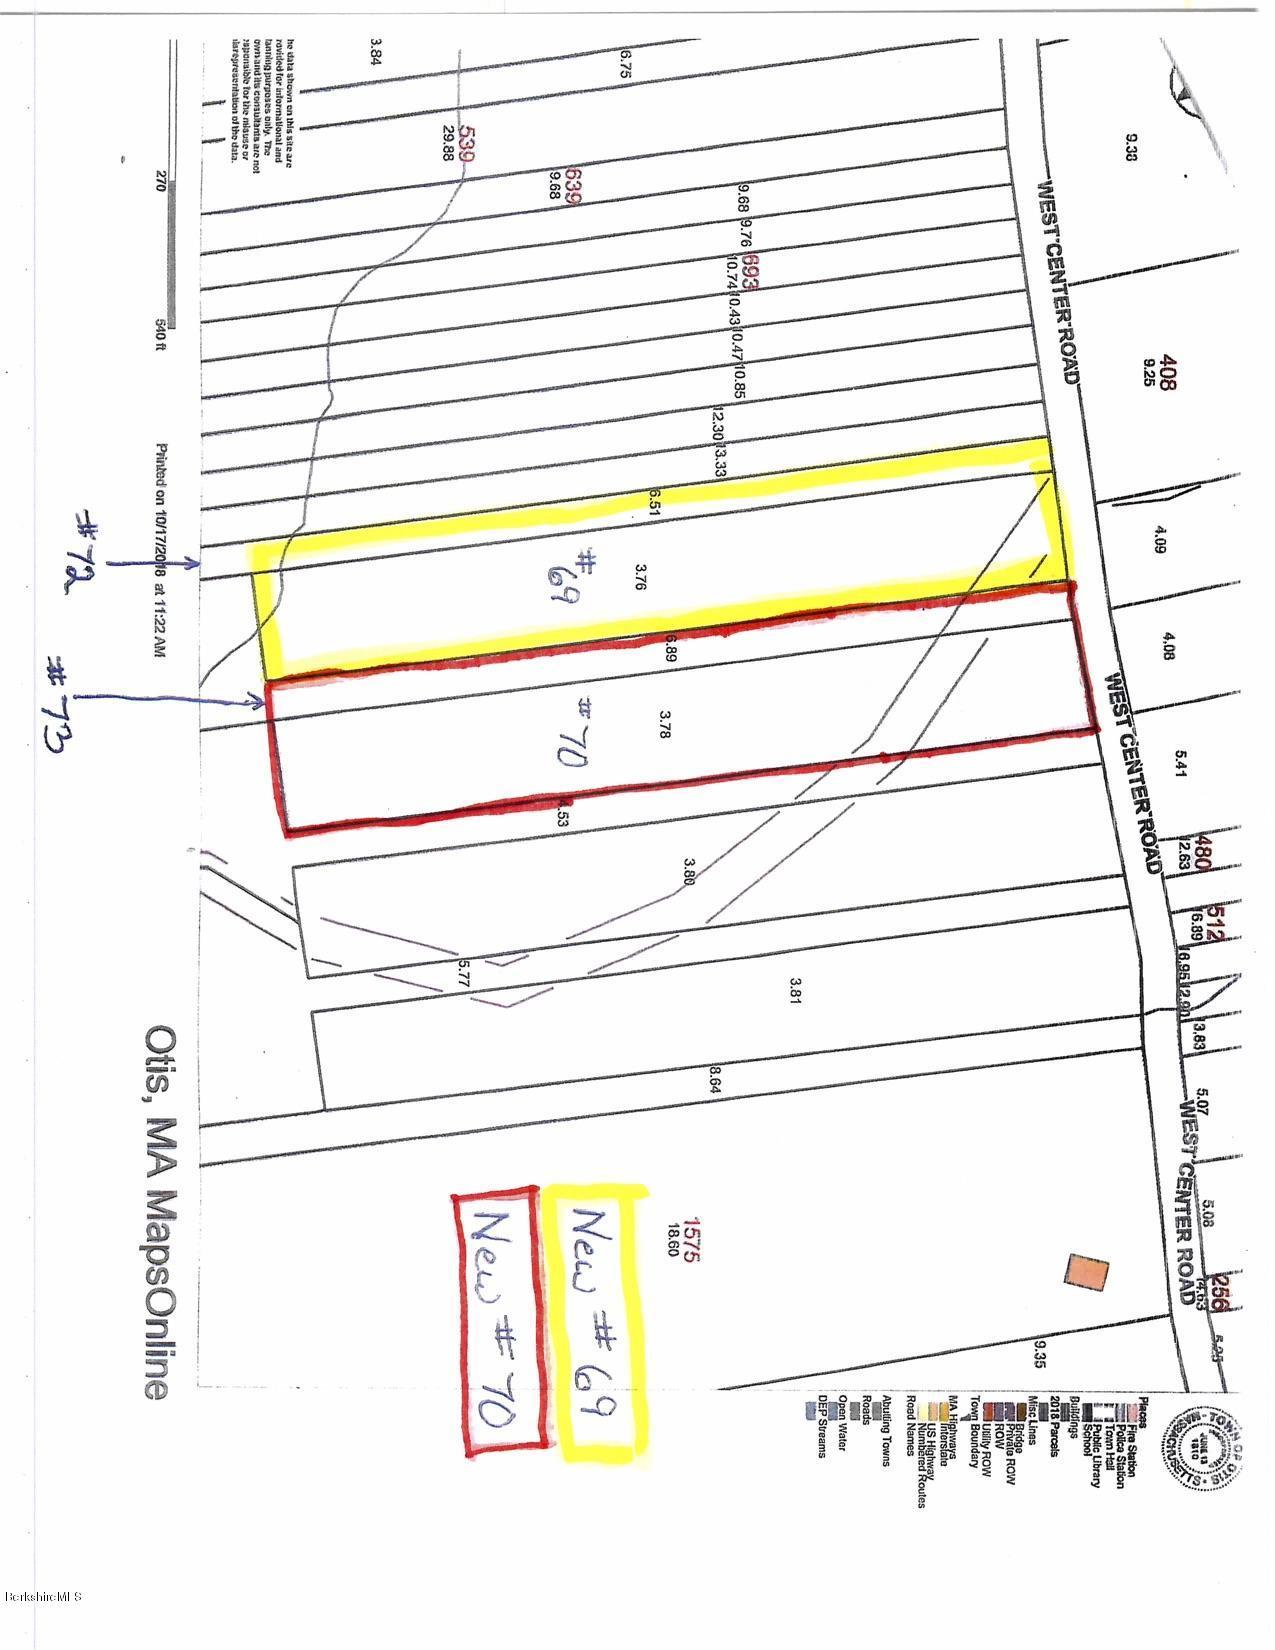 Lot # 70 West Center Rd Otis MA 01253